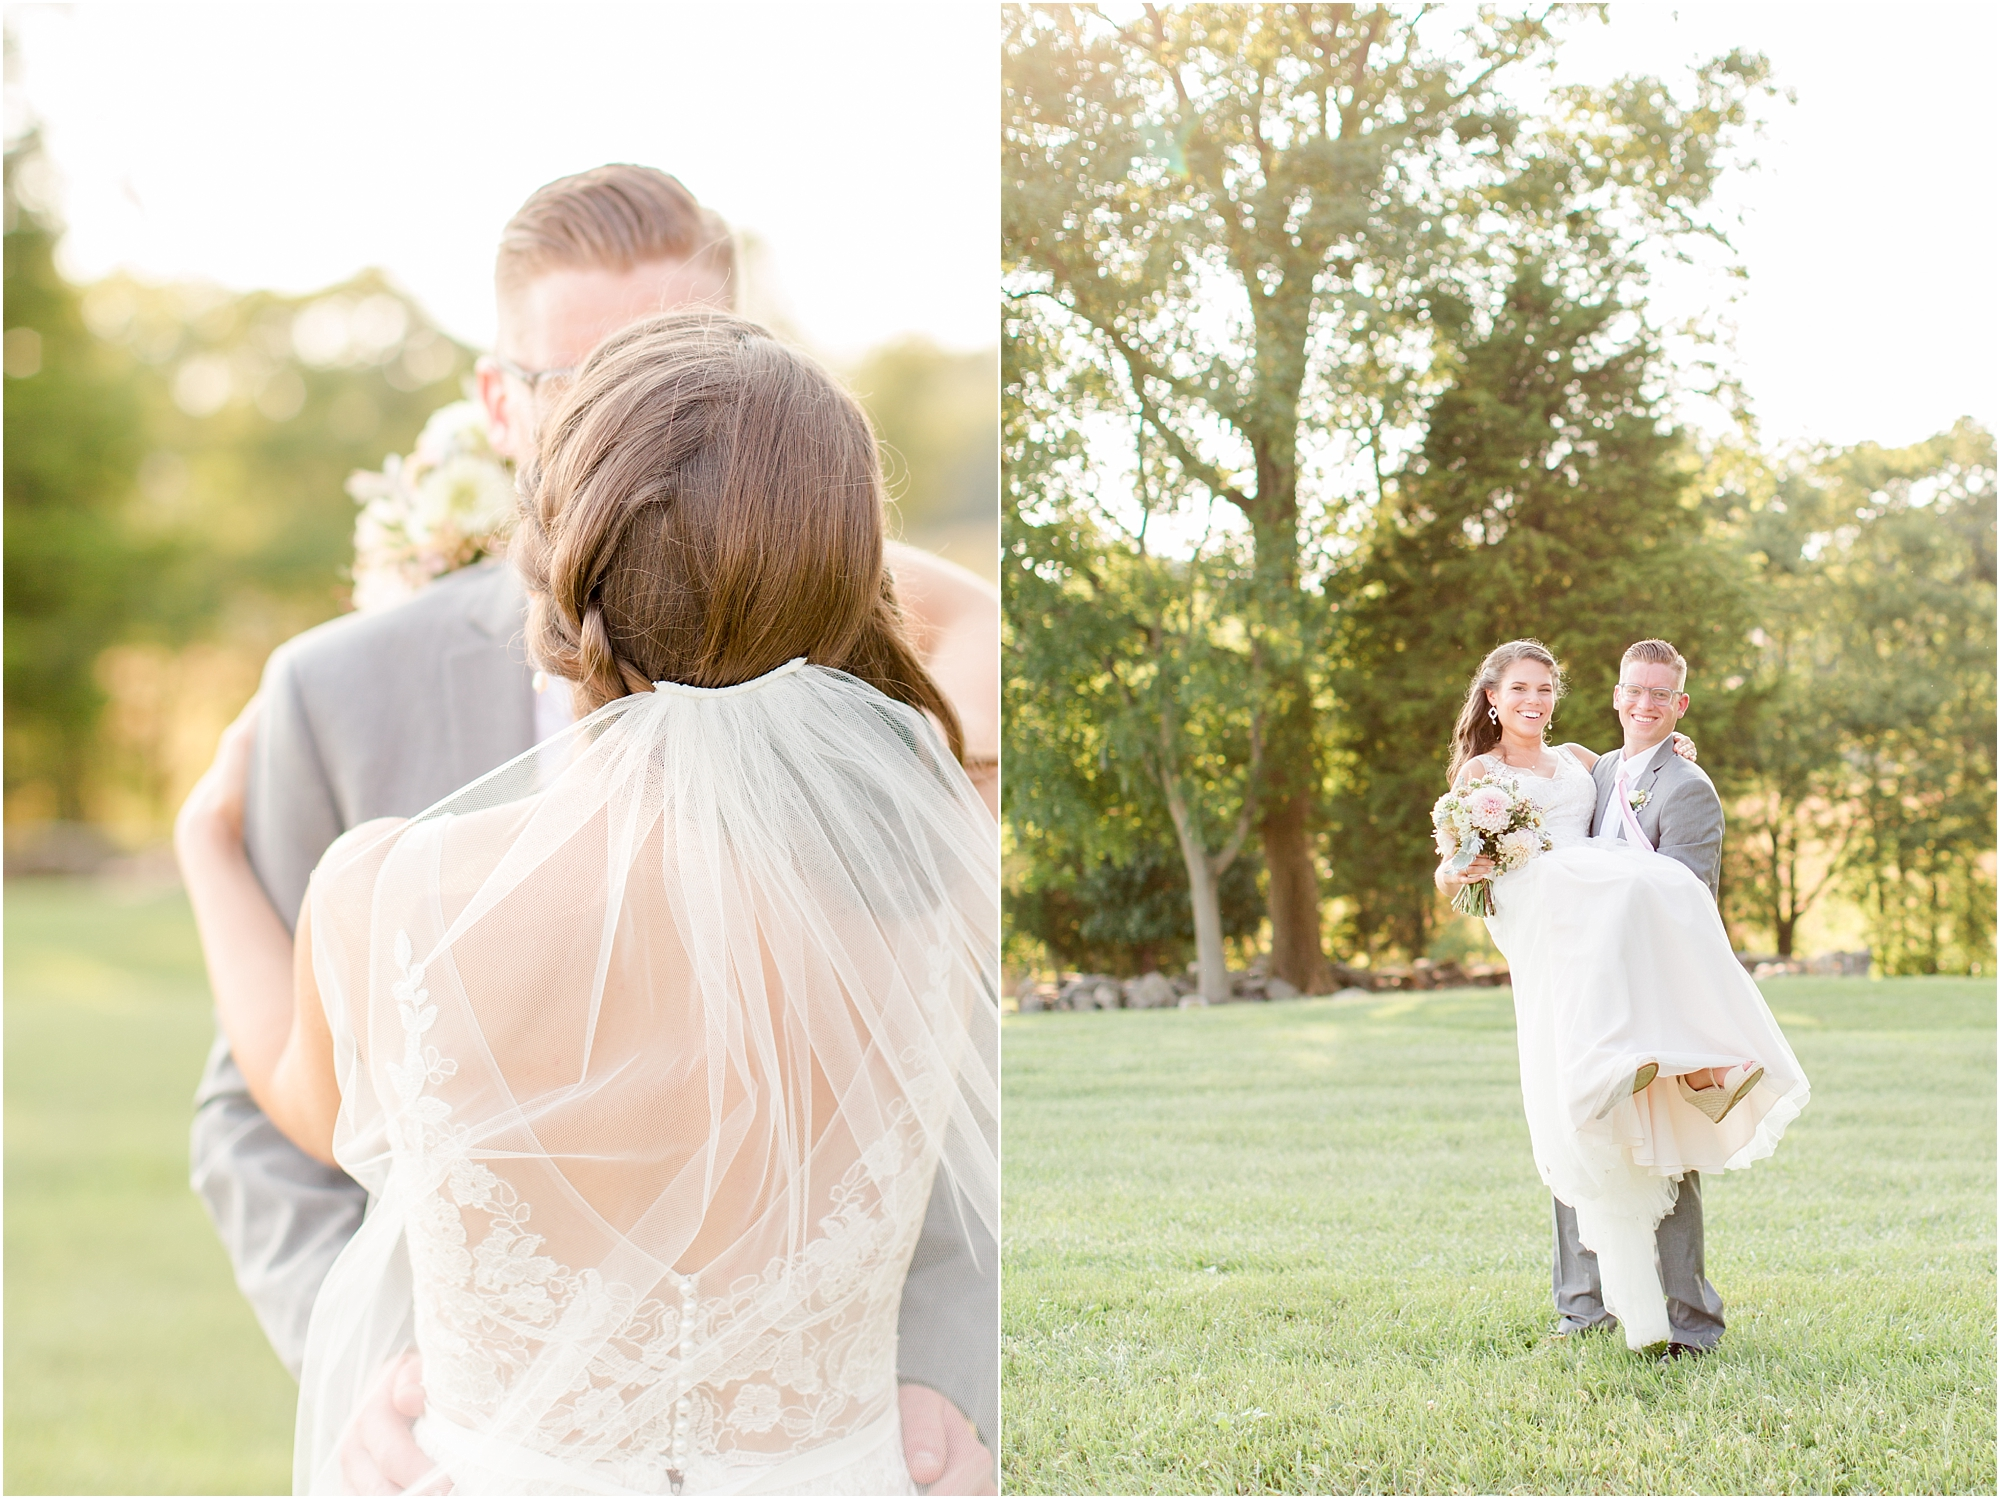 Tomaszewski 3-Bride & Groom-1101_anna grace photography baltimore maryland wedding photographer rockland estates wedding photo.jpg